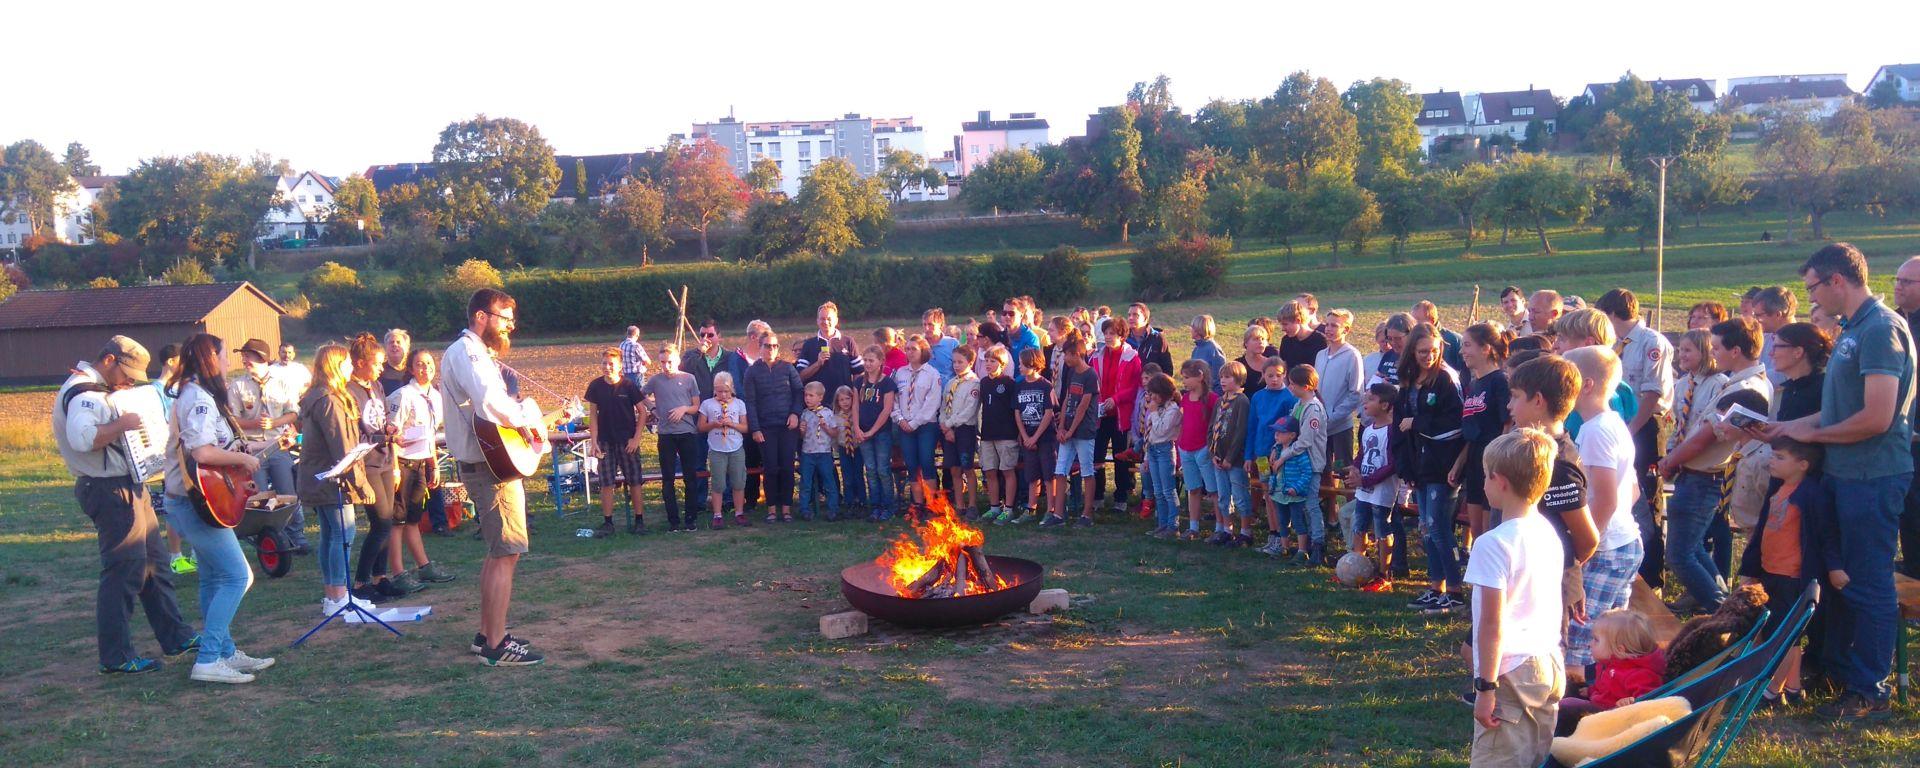 Lagerfeuer-Atmospäre beim Familiengrillabend